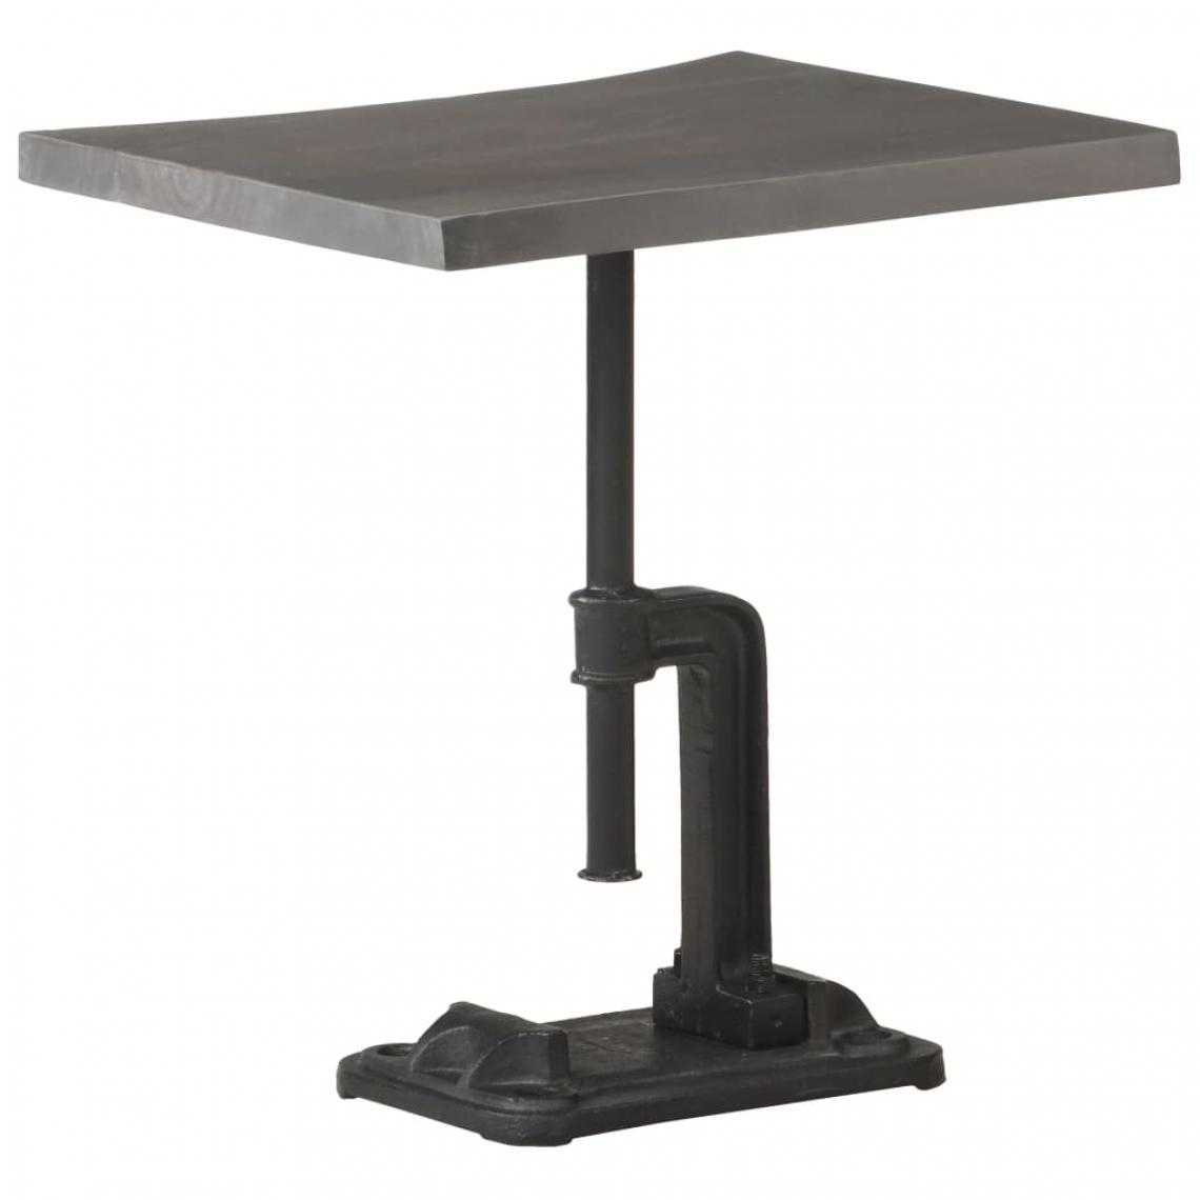 Chunhelife Table d'appoint Gris 45x35x48 cm Bois d'acacia massif et fonte